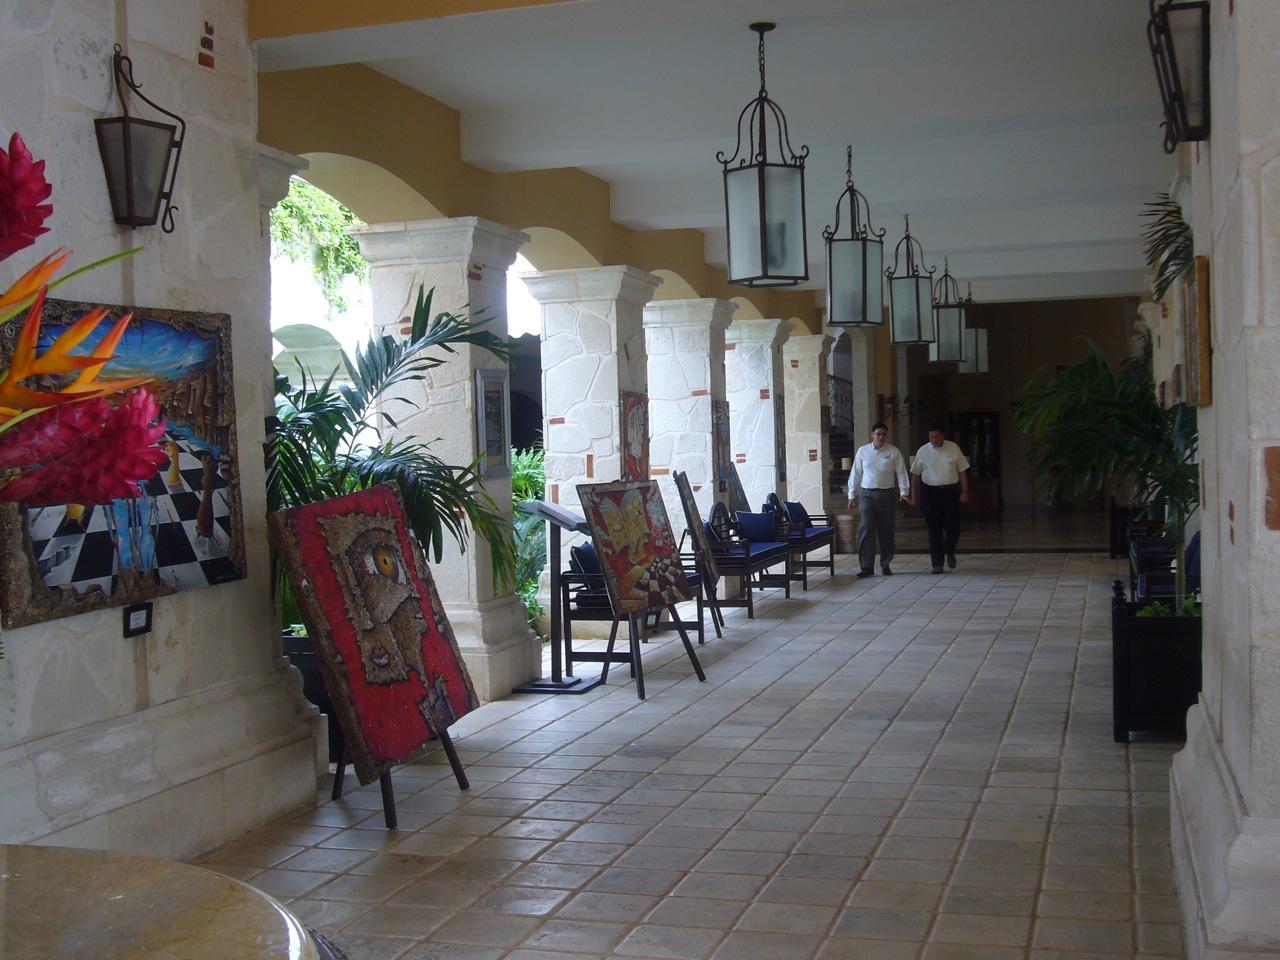 Royal Hideaway Hotel Formentor